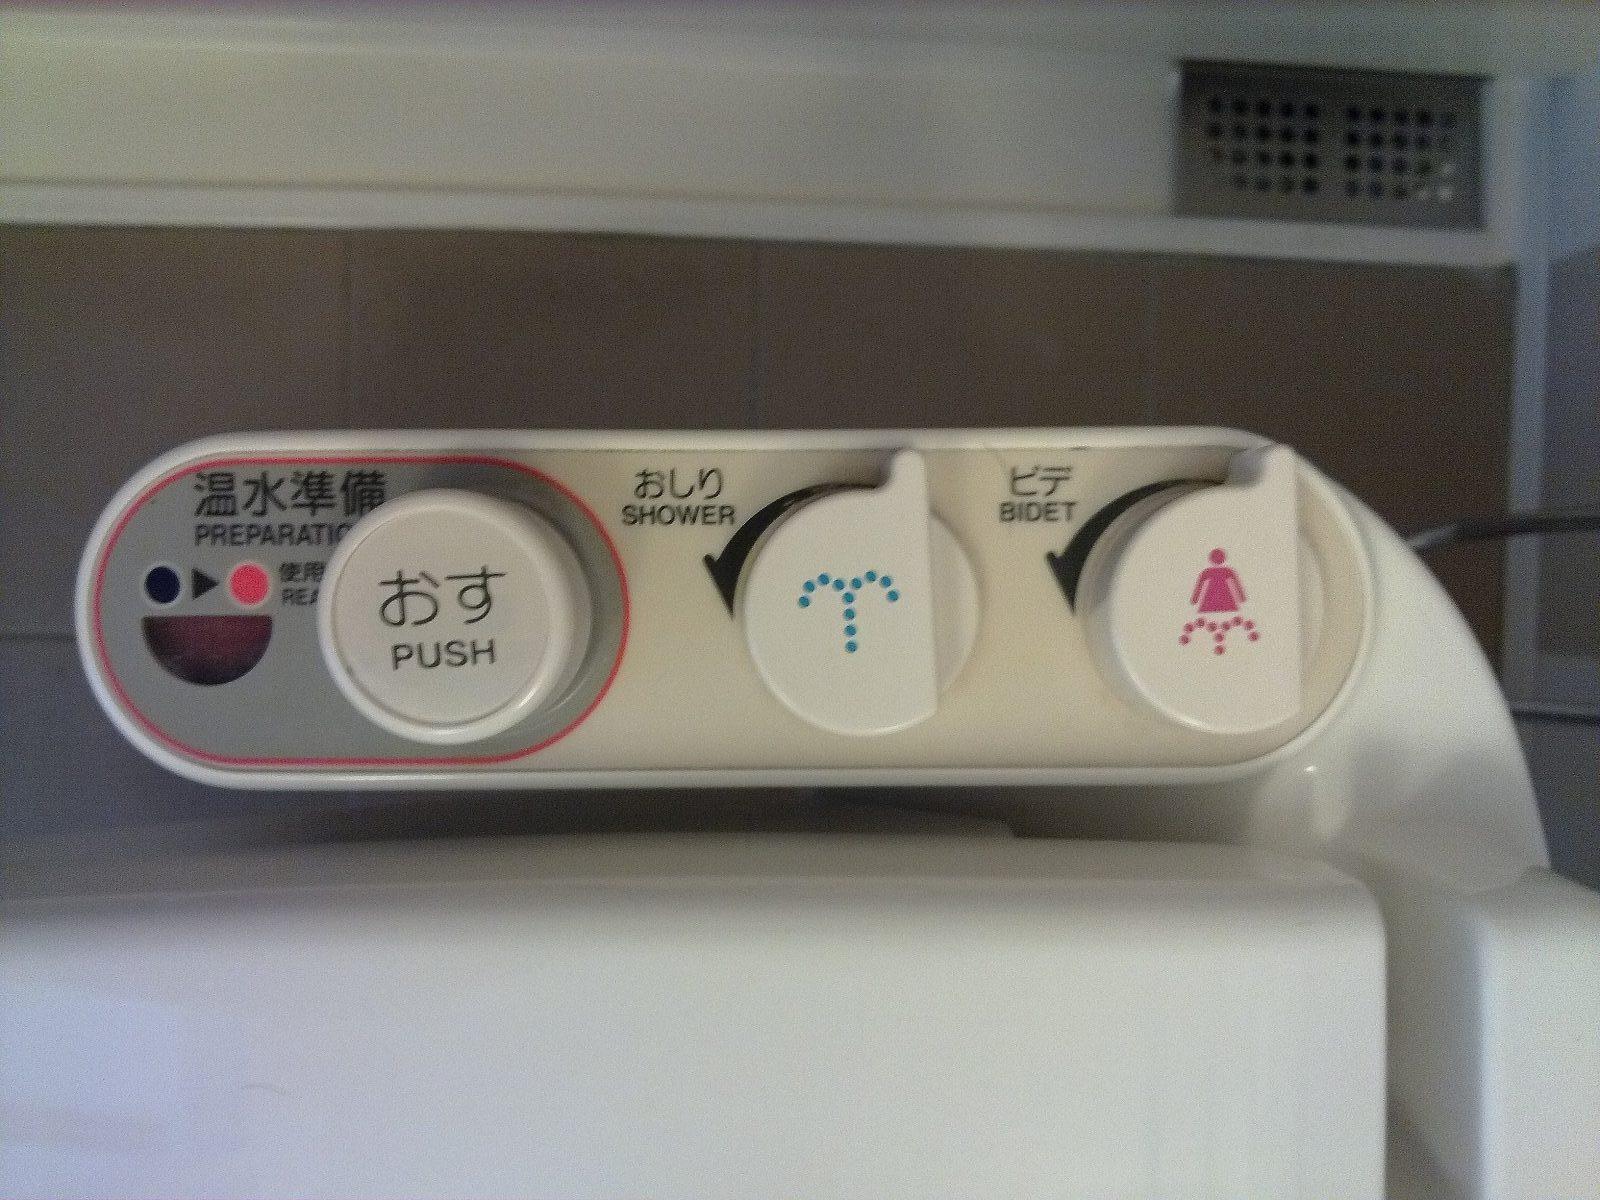 A toilet at the Toto Showroom in Shinjuku